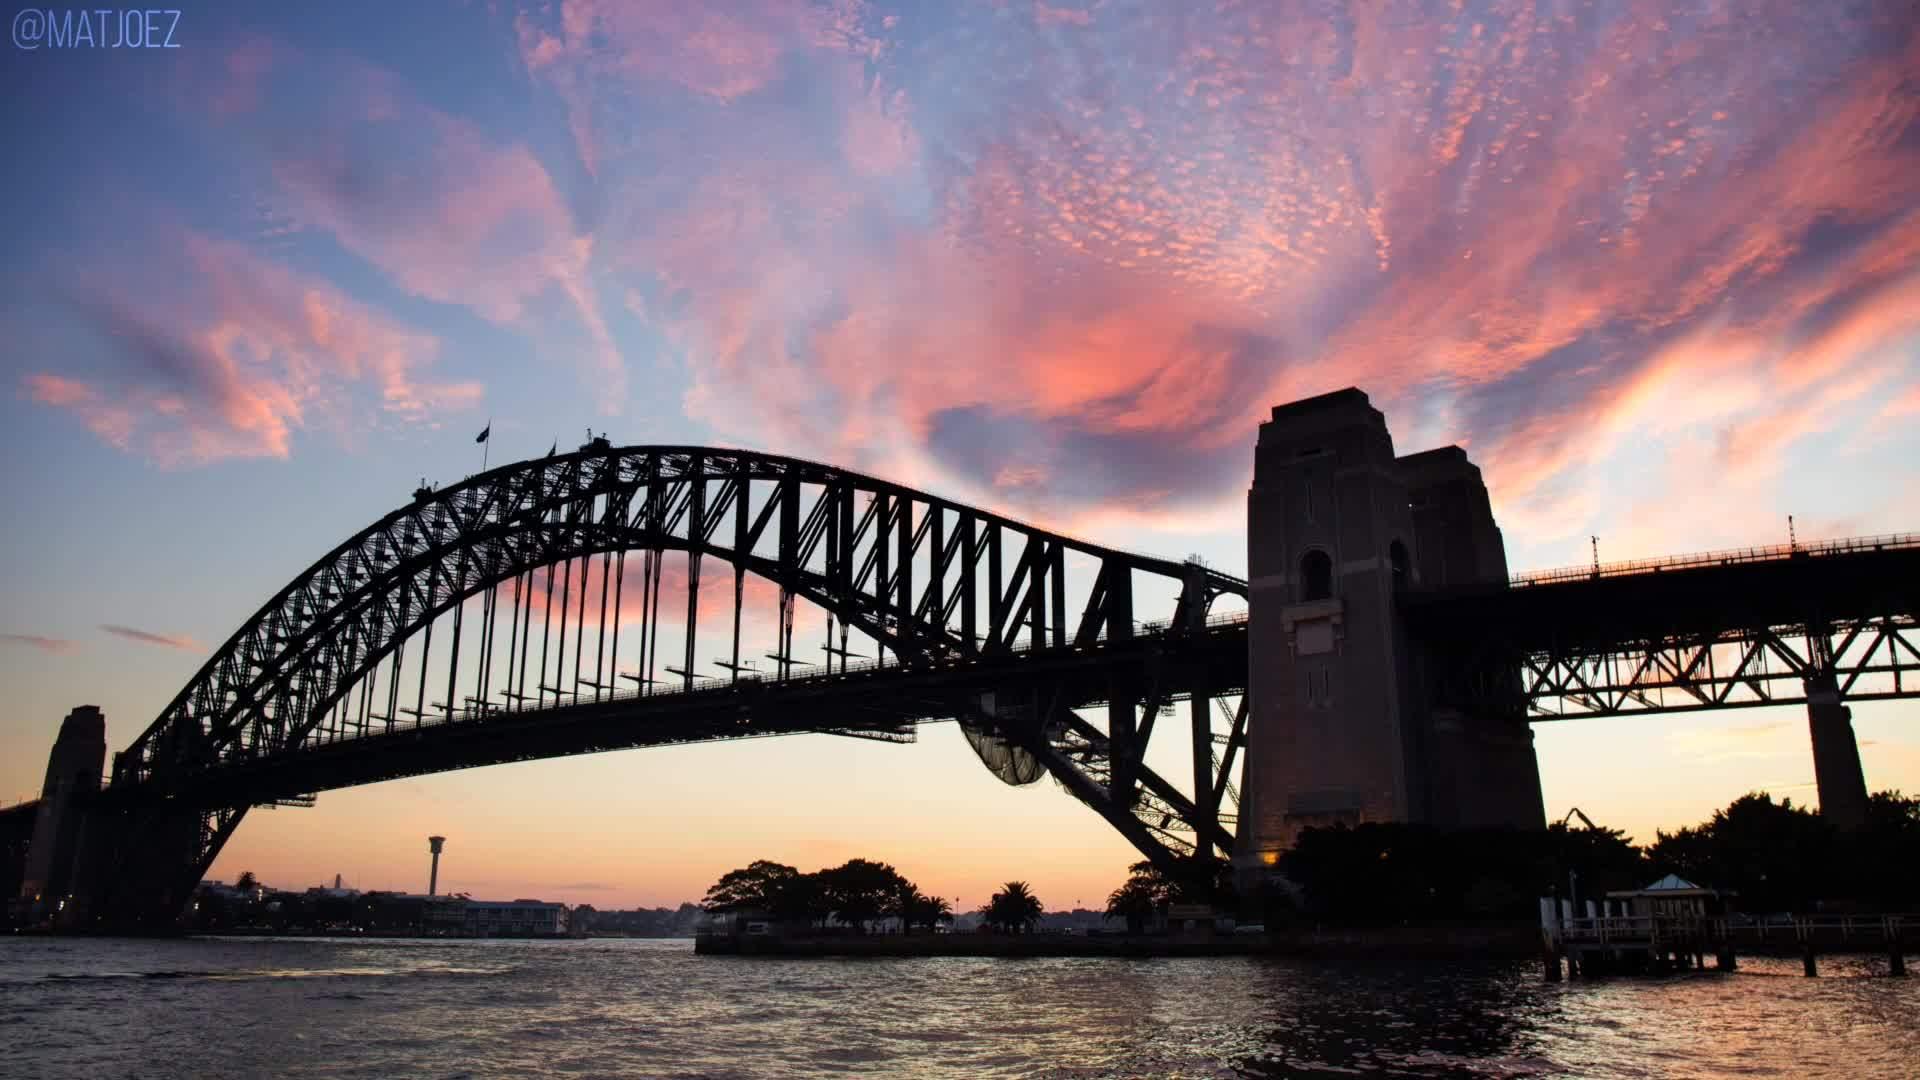 australia, cloudporn, matjoez, Sunset in Sydney GIFs